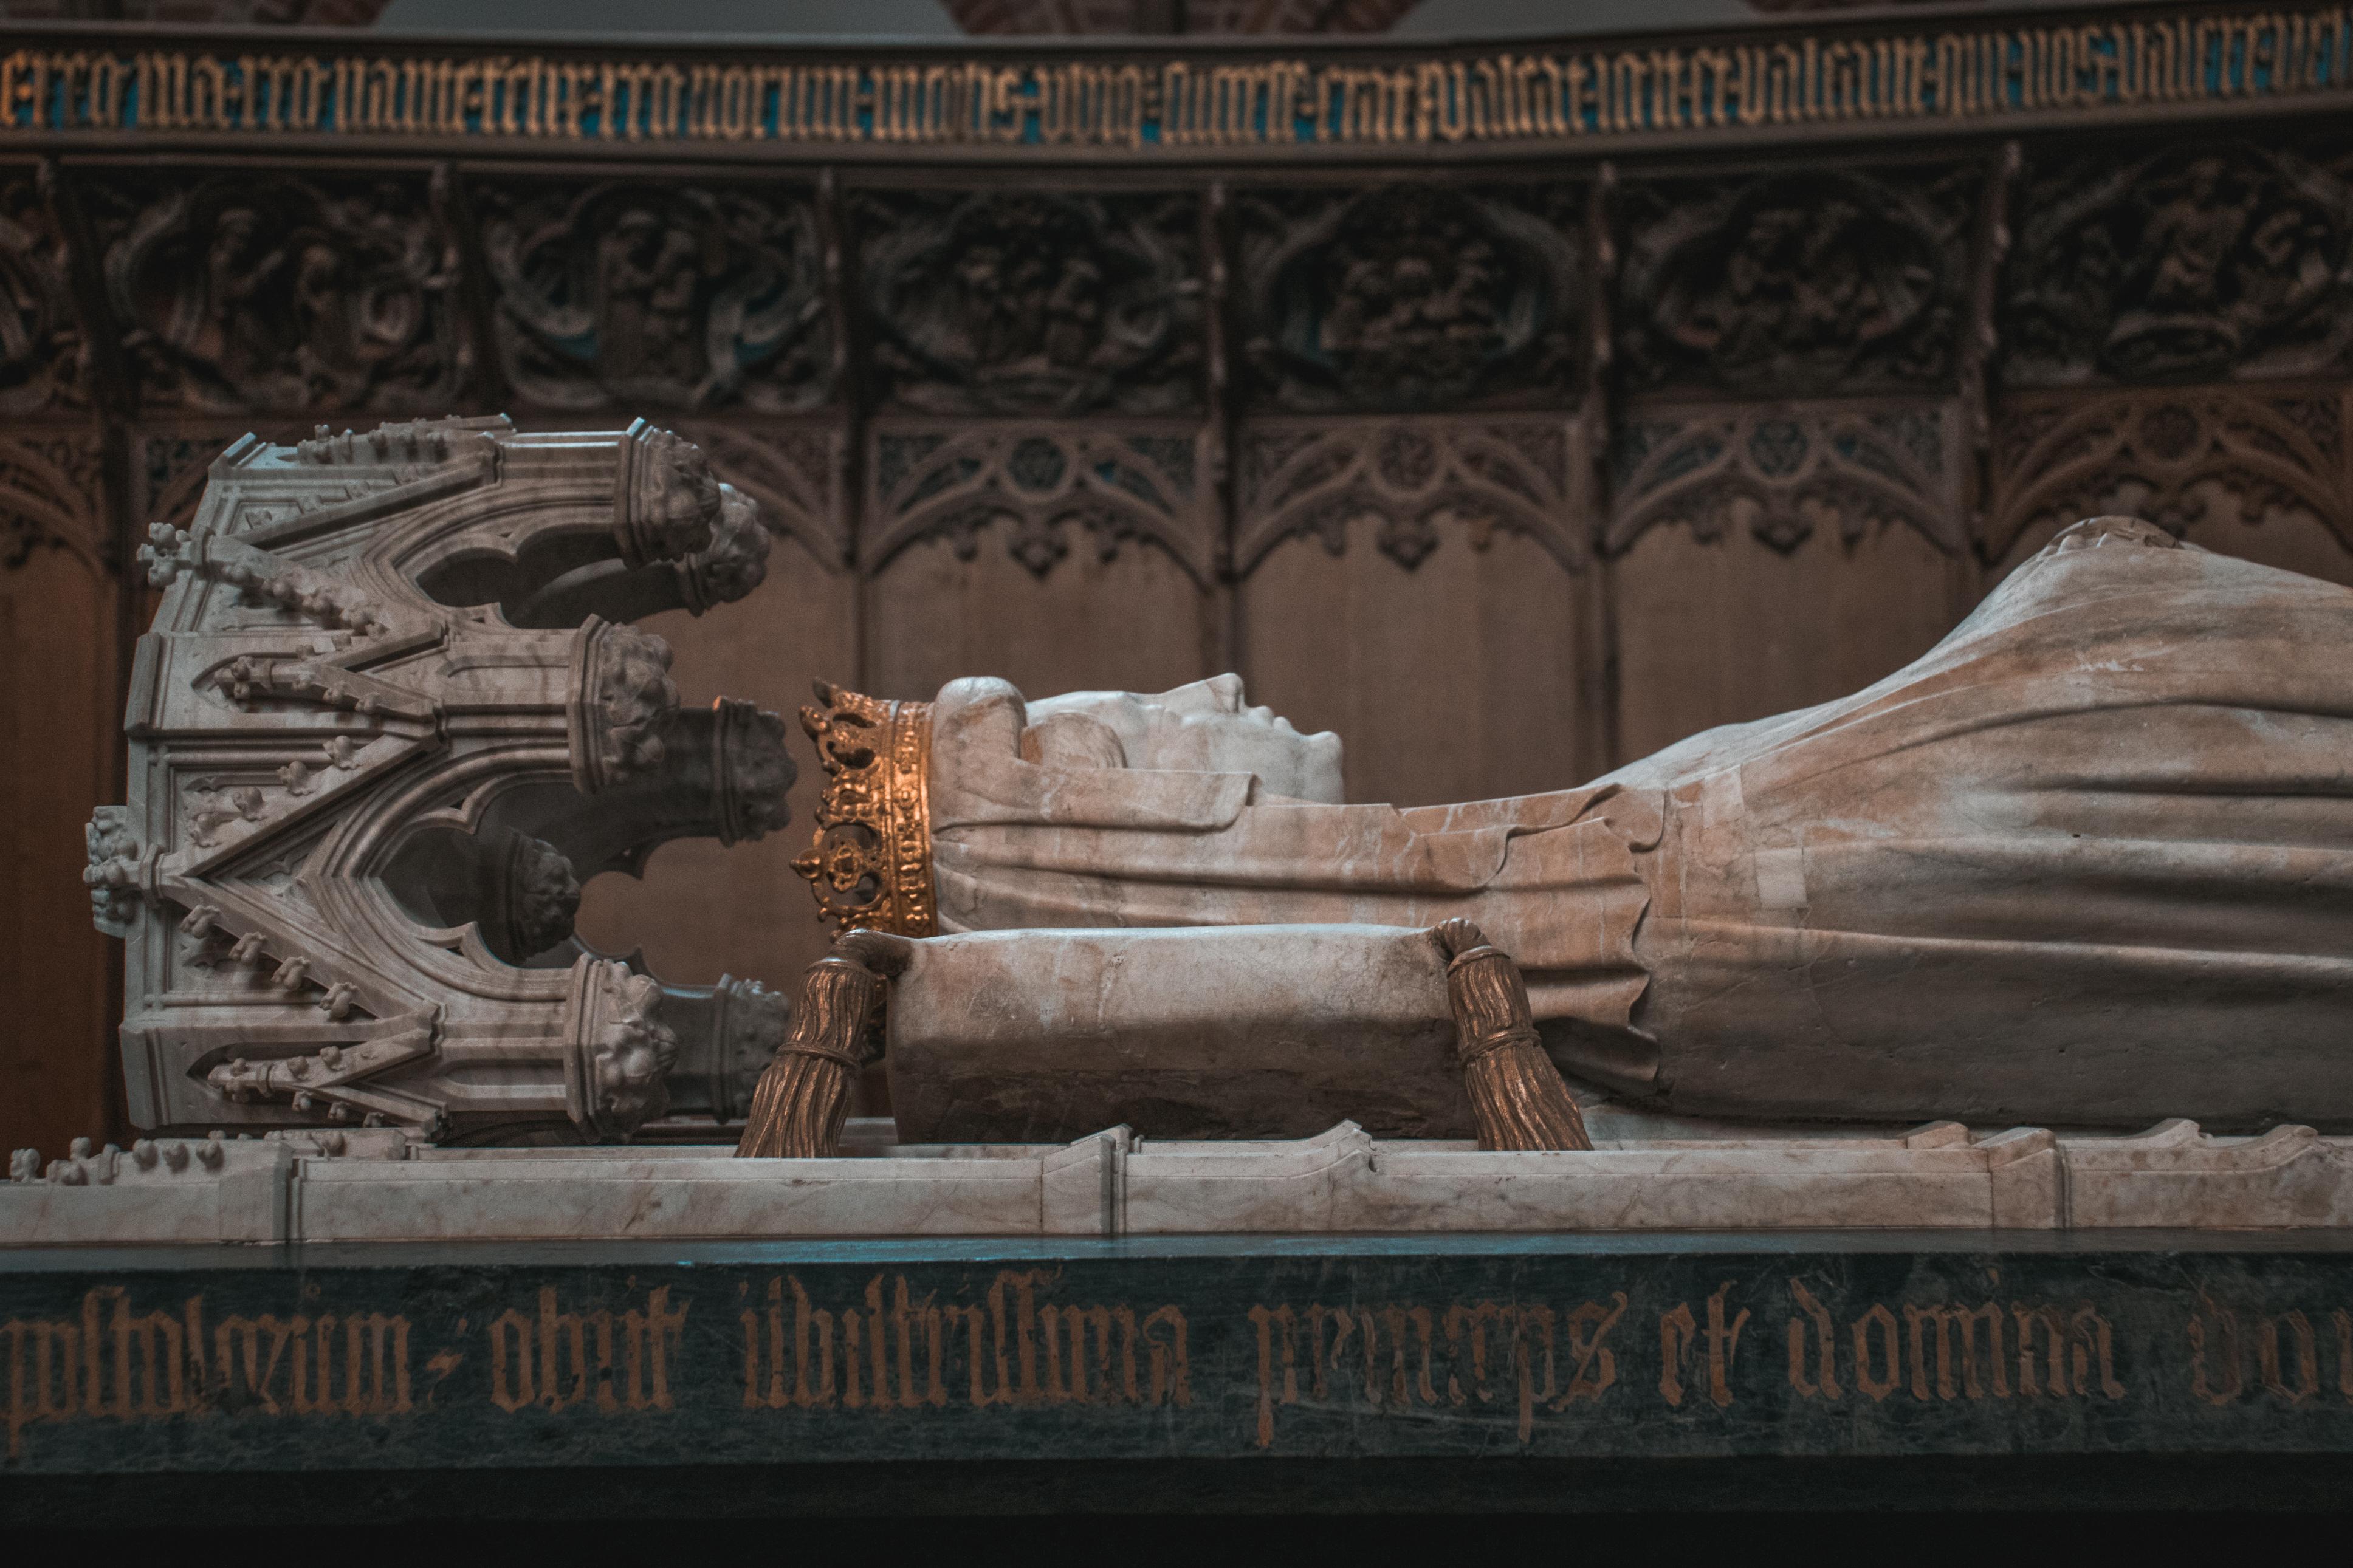 Sarcophagus of Queen Margaret I of Denmark, Norway and Sweden. Photo: iStock